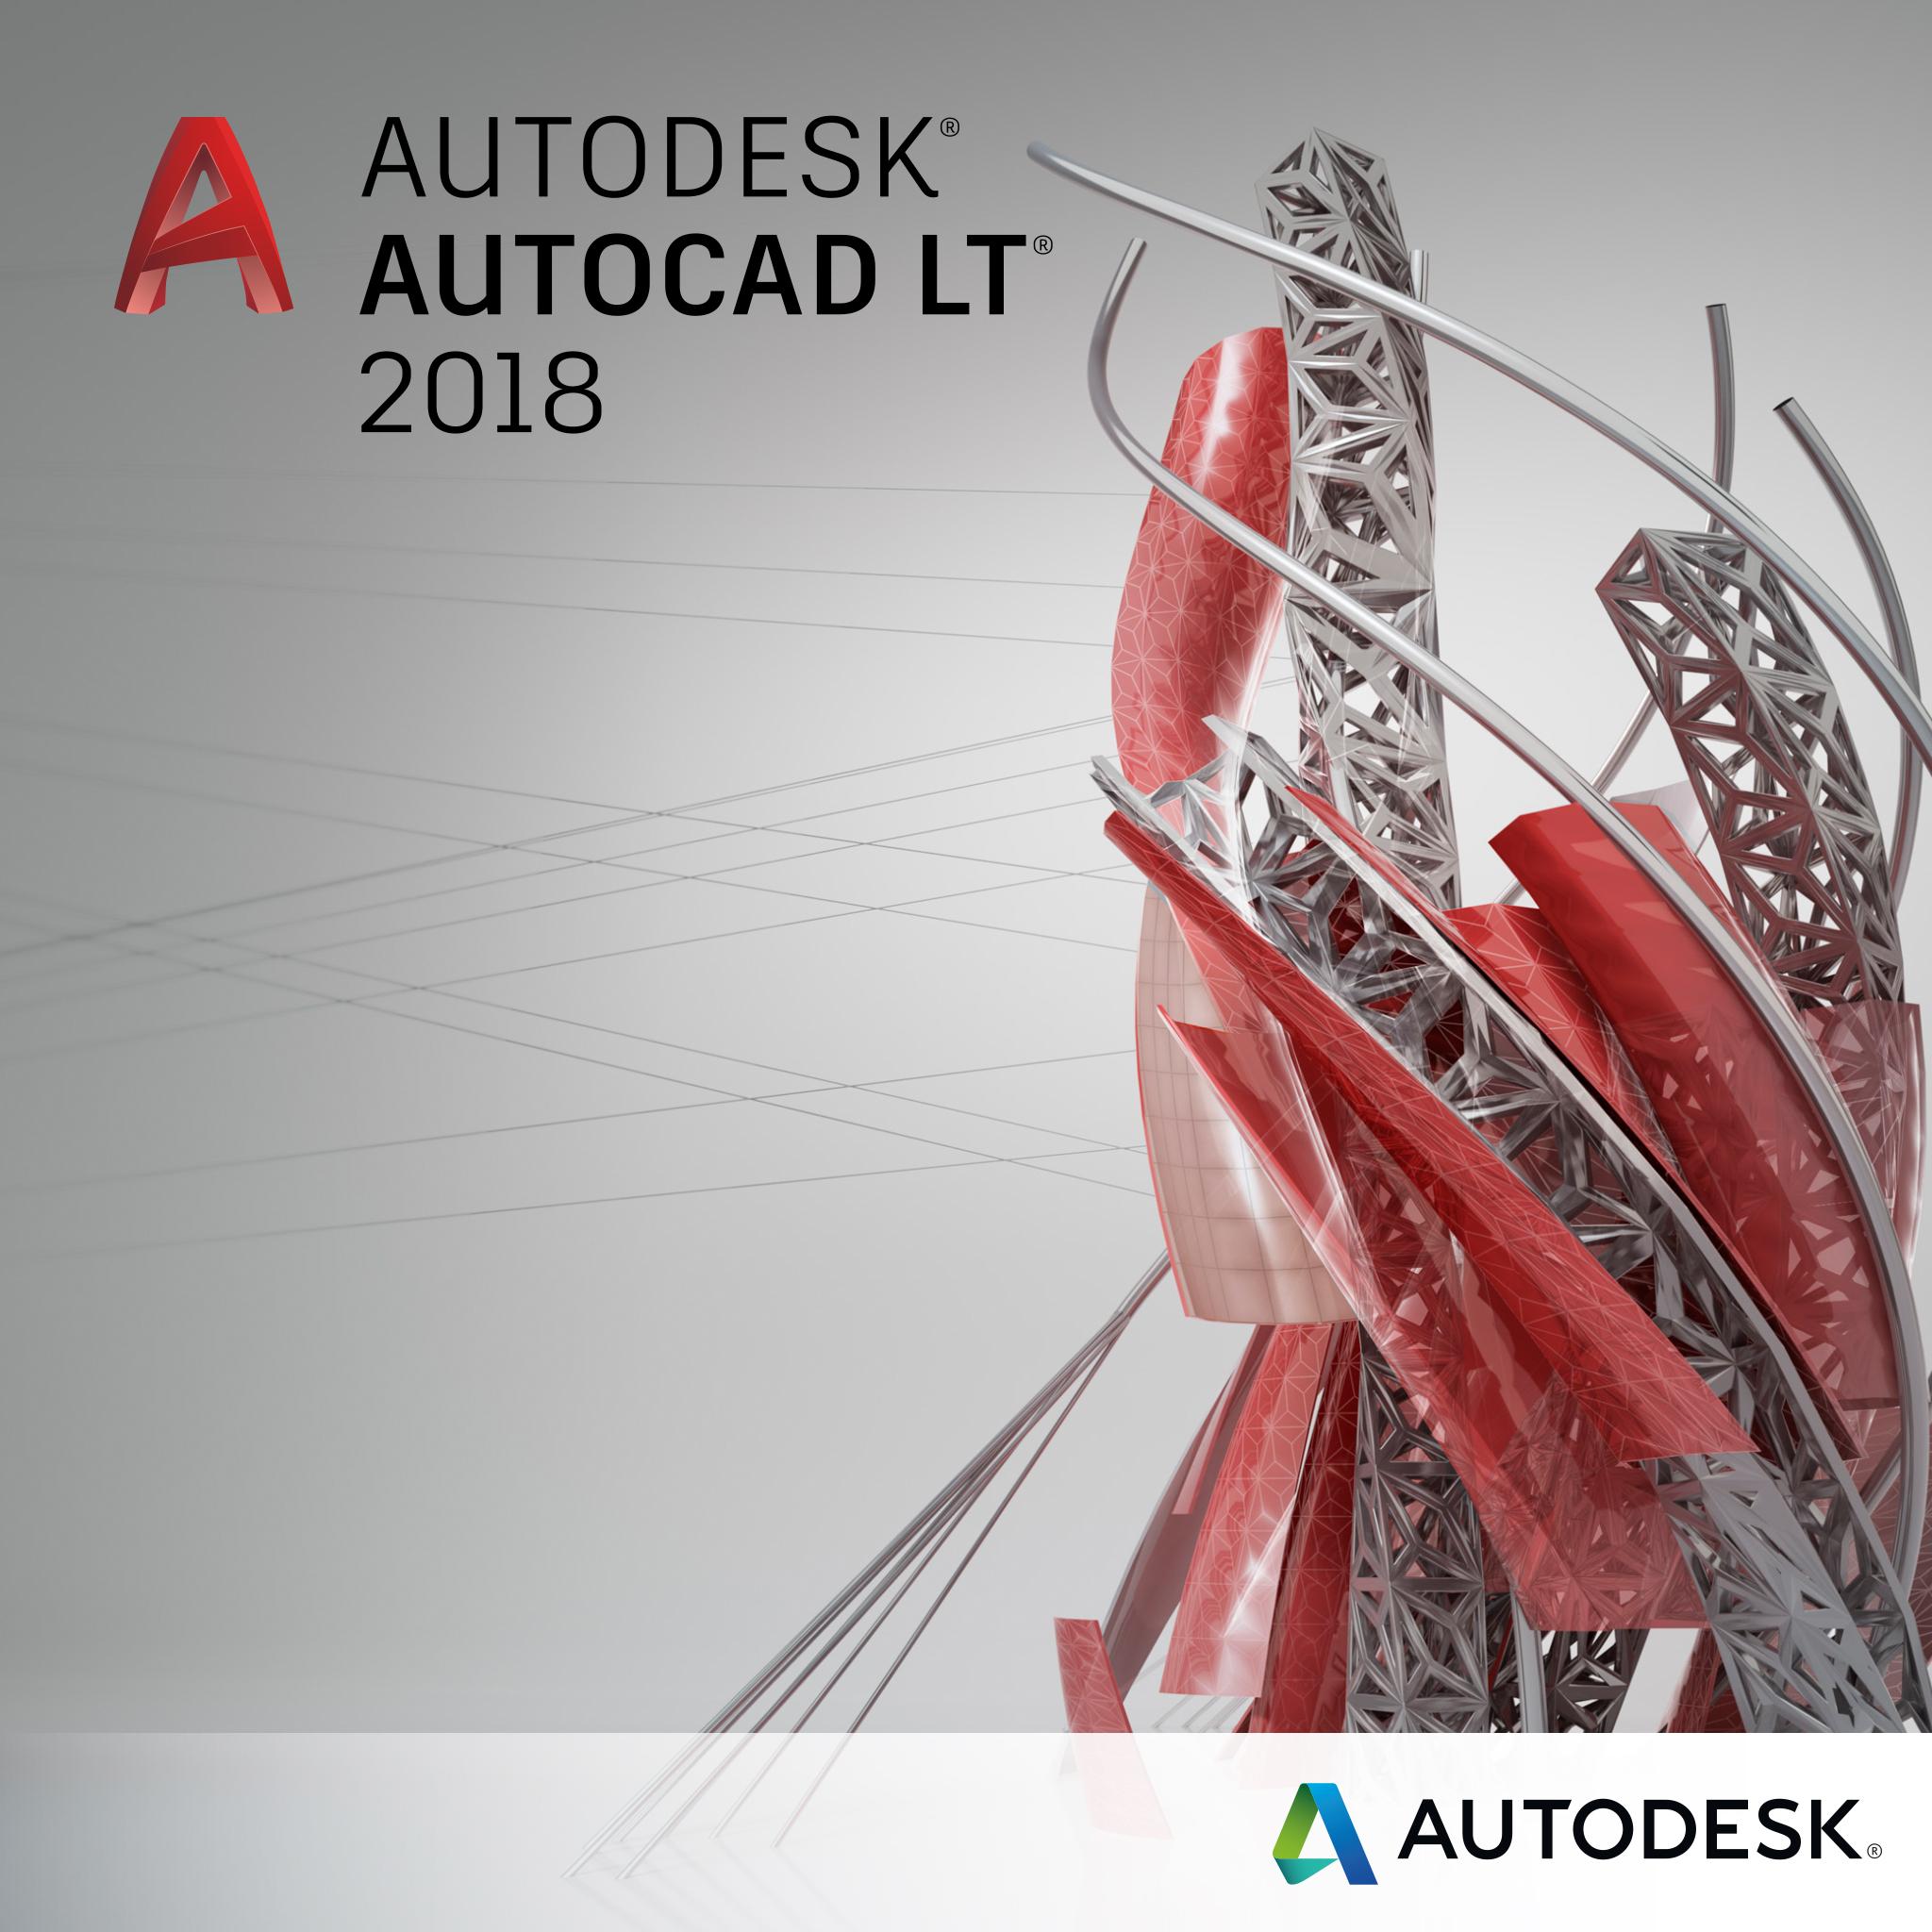 AutoCAD LT badge